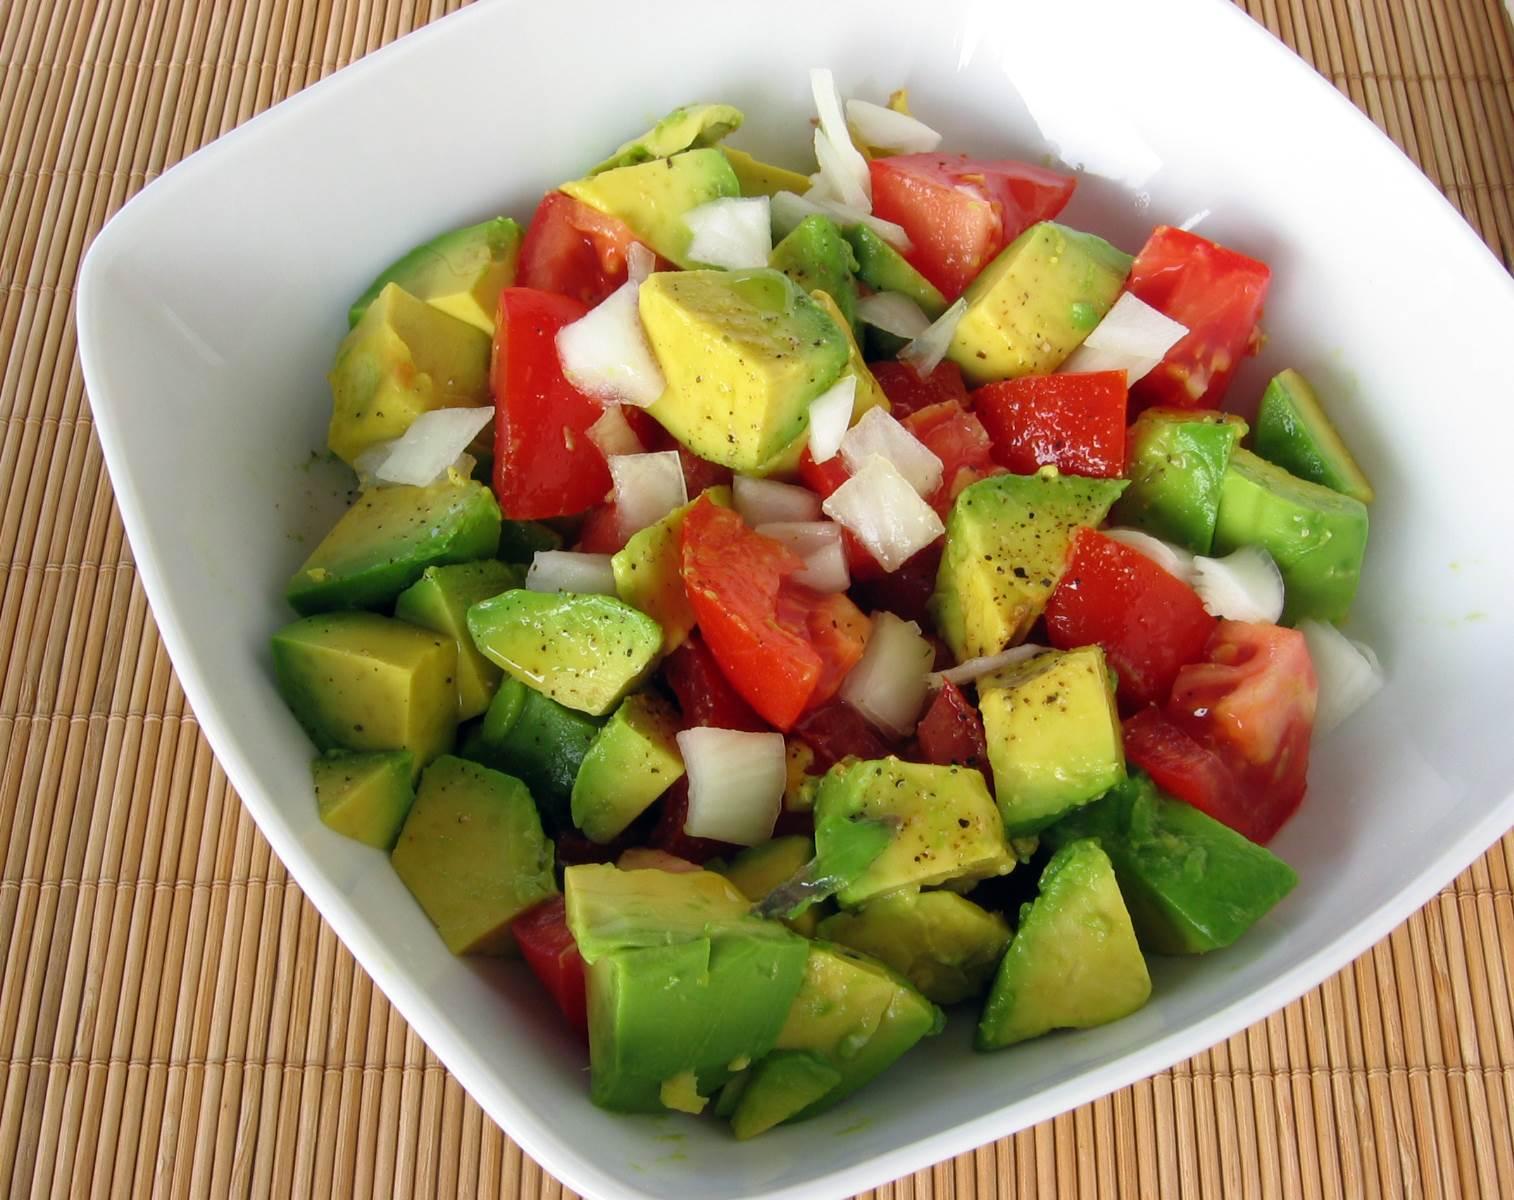 Comment cuisiner tomate - Cuisiner des tomates vertes ...